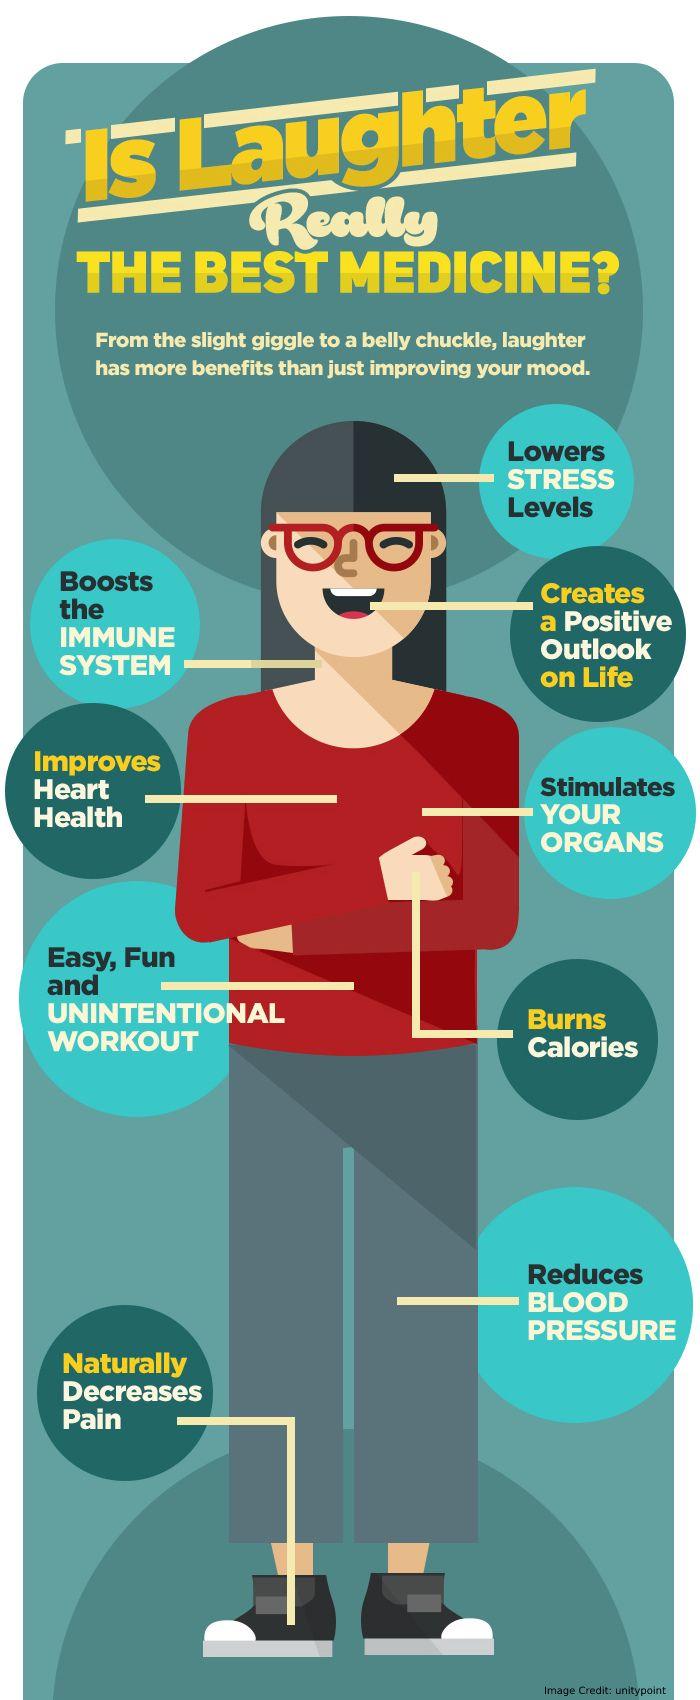 Laughter Yoga Exercises Secret to a Happier, Healthier